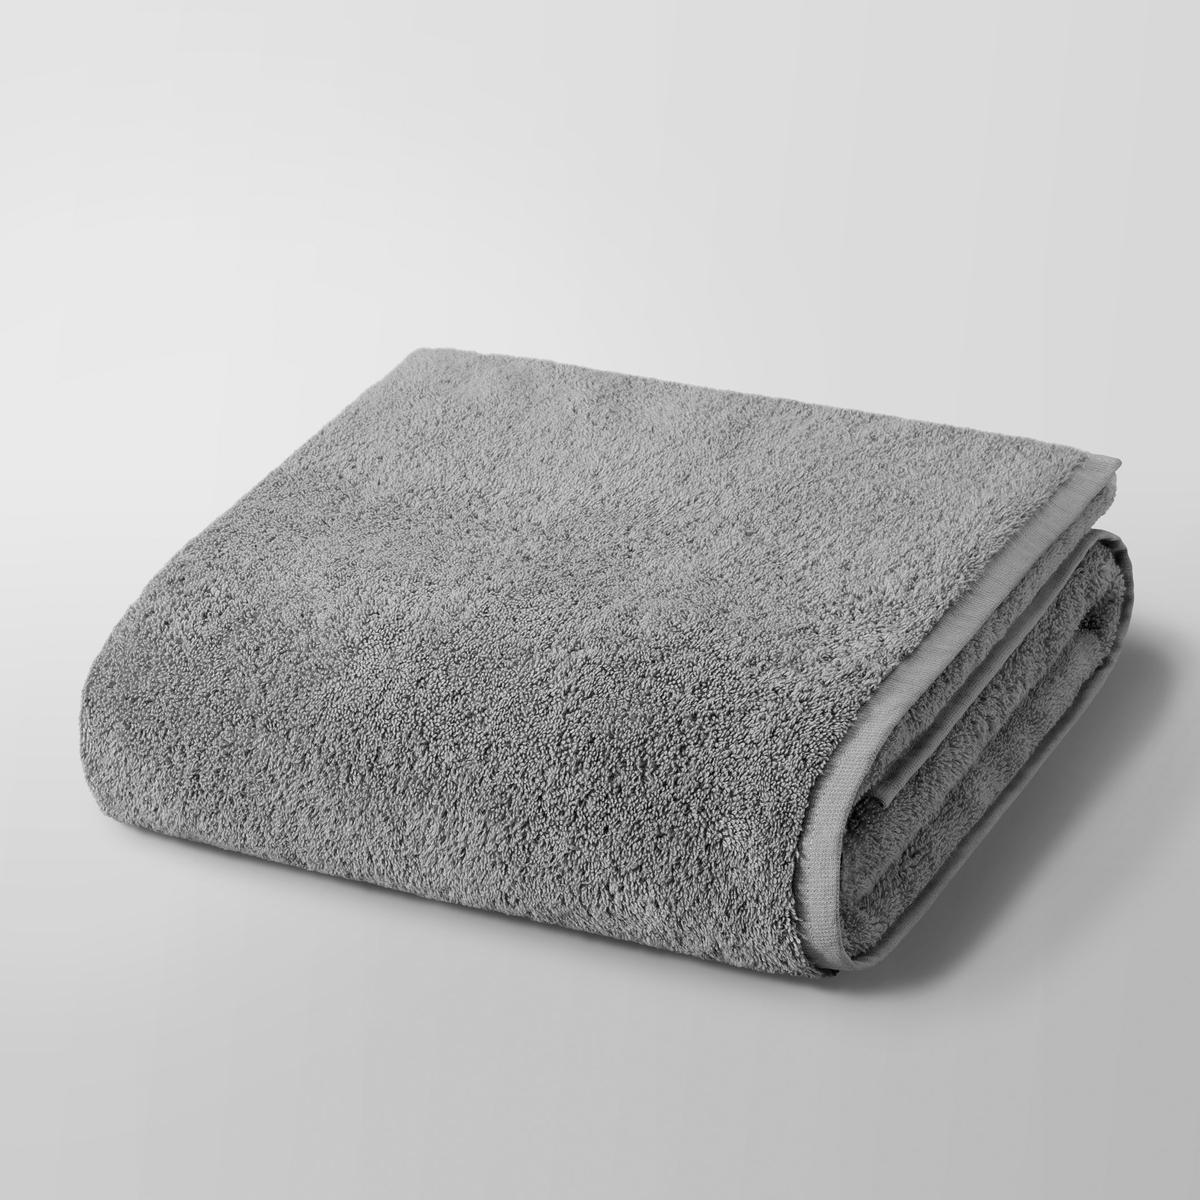 Полотенце для душа макси Gilbear, 100% хлопок<br><br>Цвет: светло-серый